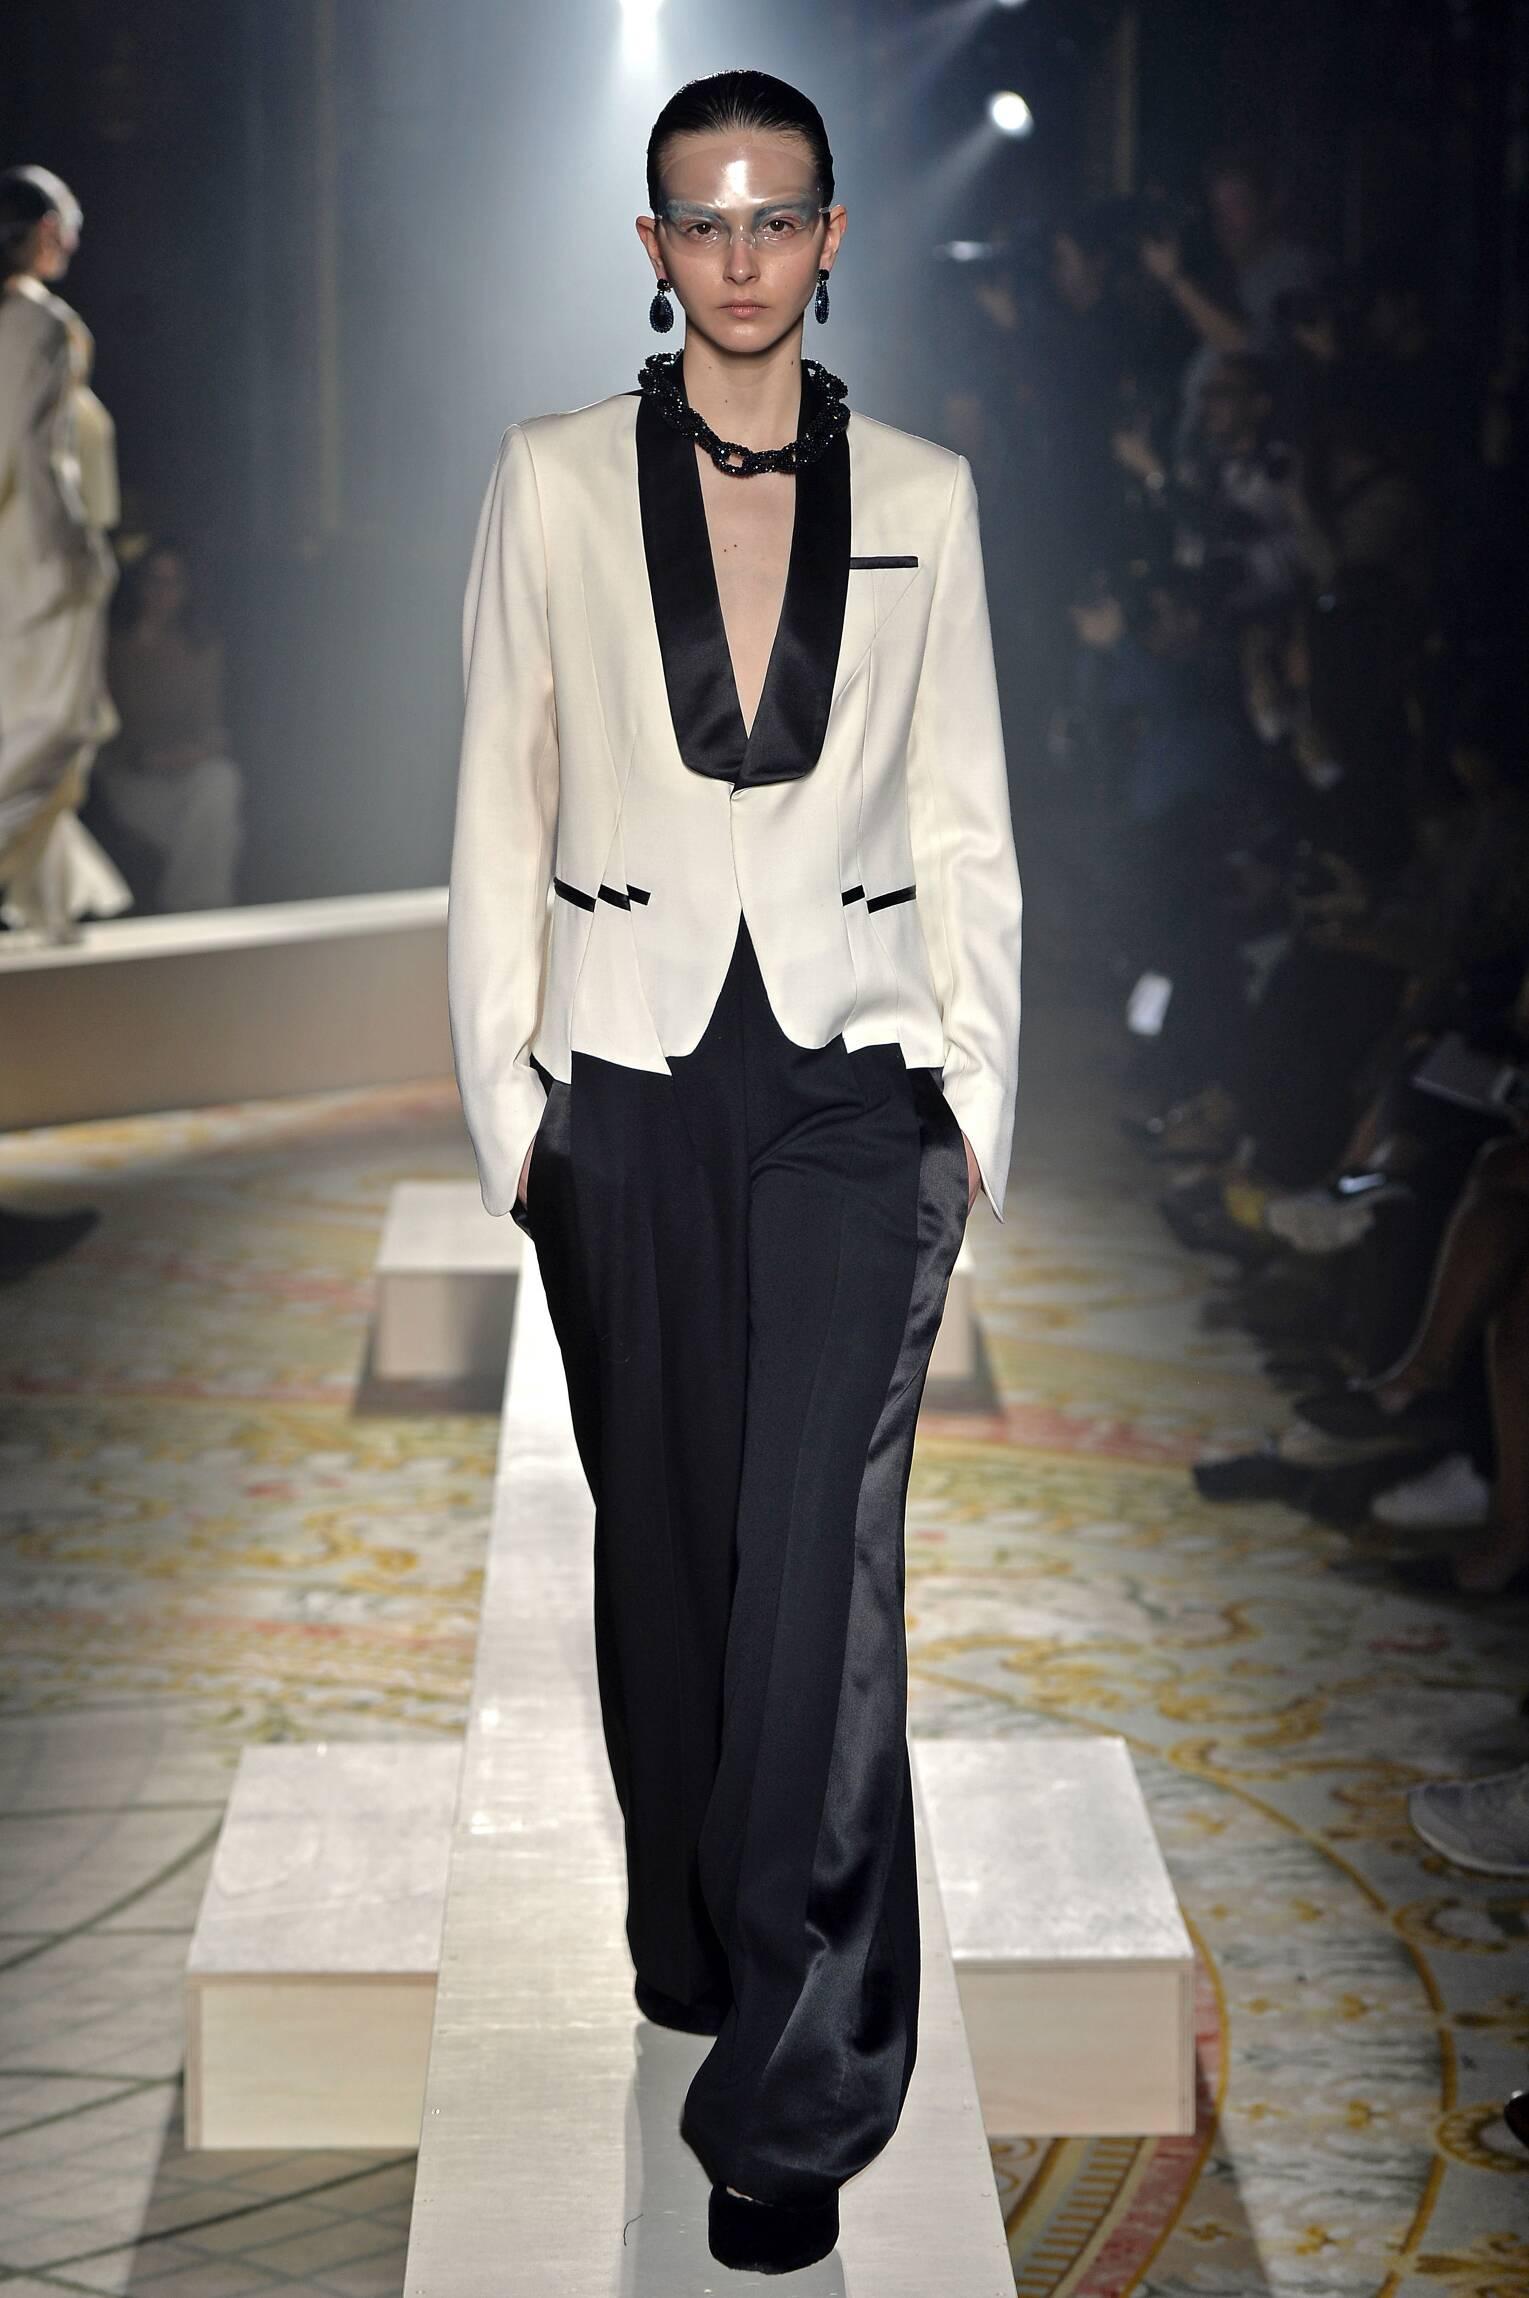 Runway Undercover Fashion Show Winter 2015